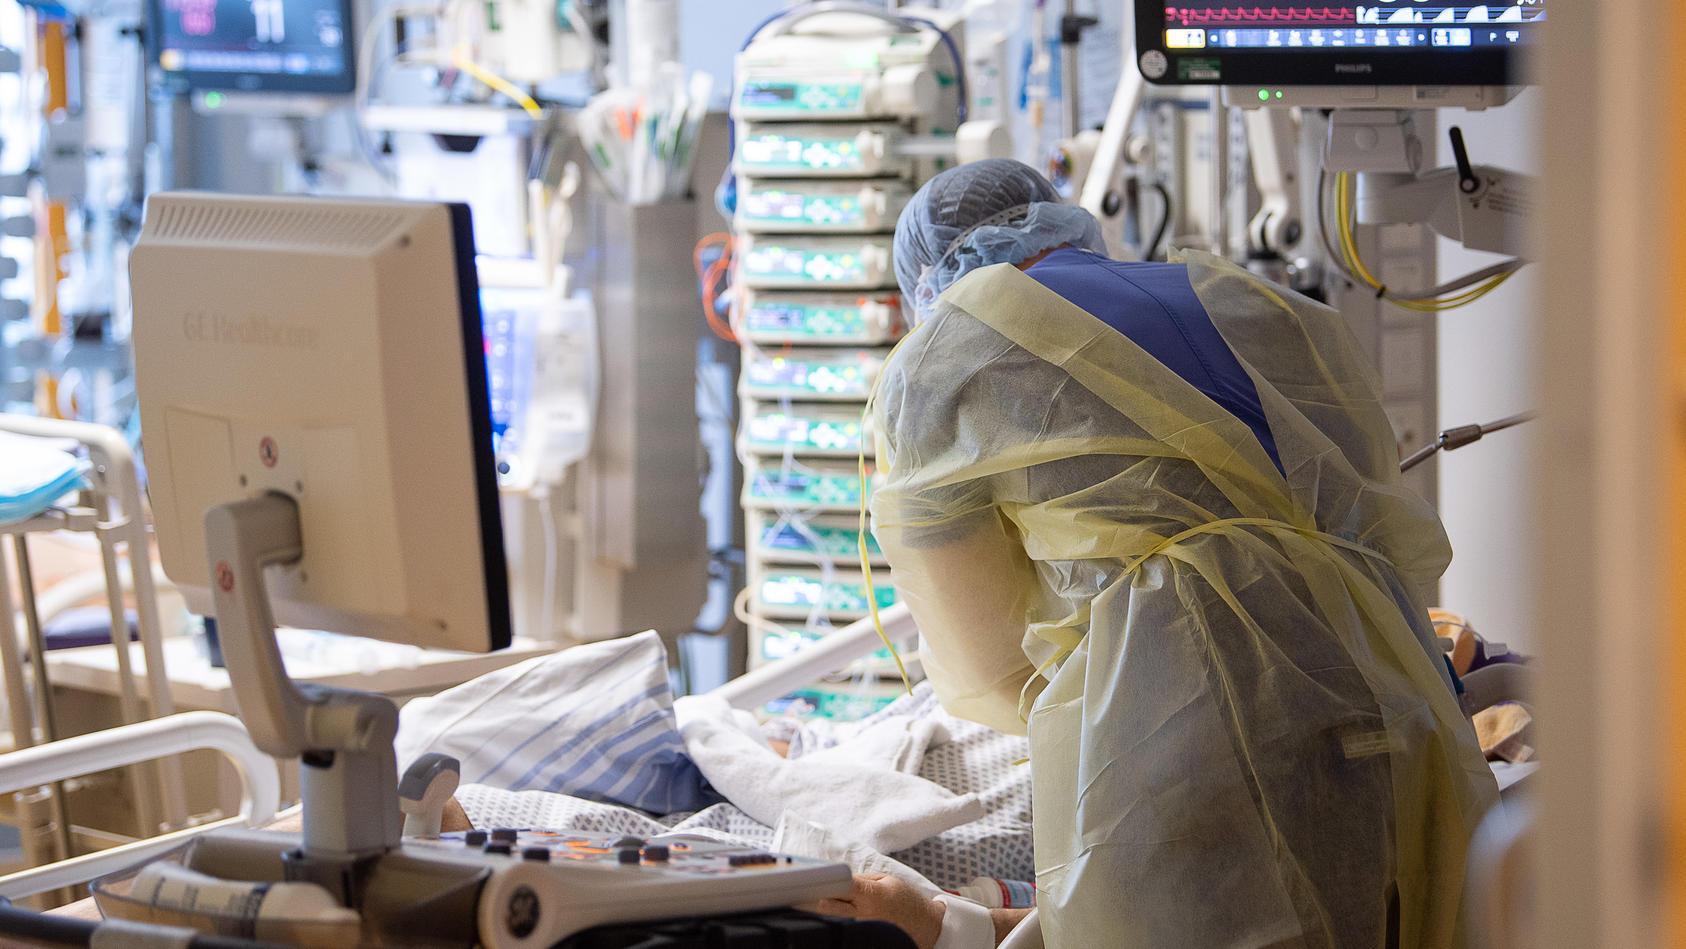 corona-patienten-die-im-krankenhaus-behandelt-wurden-leiden-besonders-haufig-unter-gedachtnisproblemen